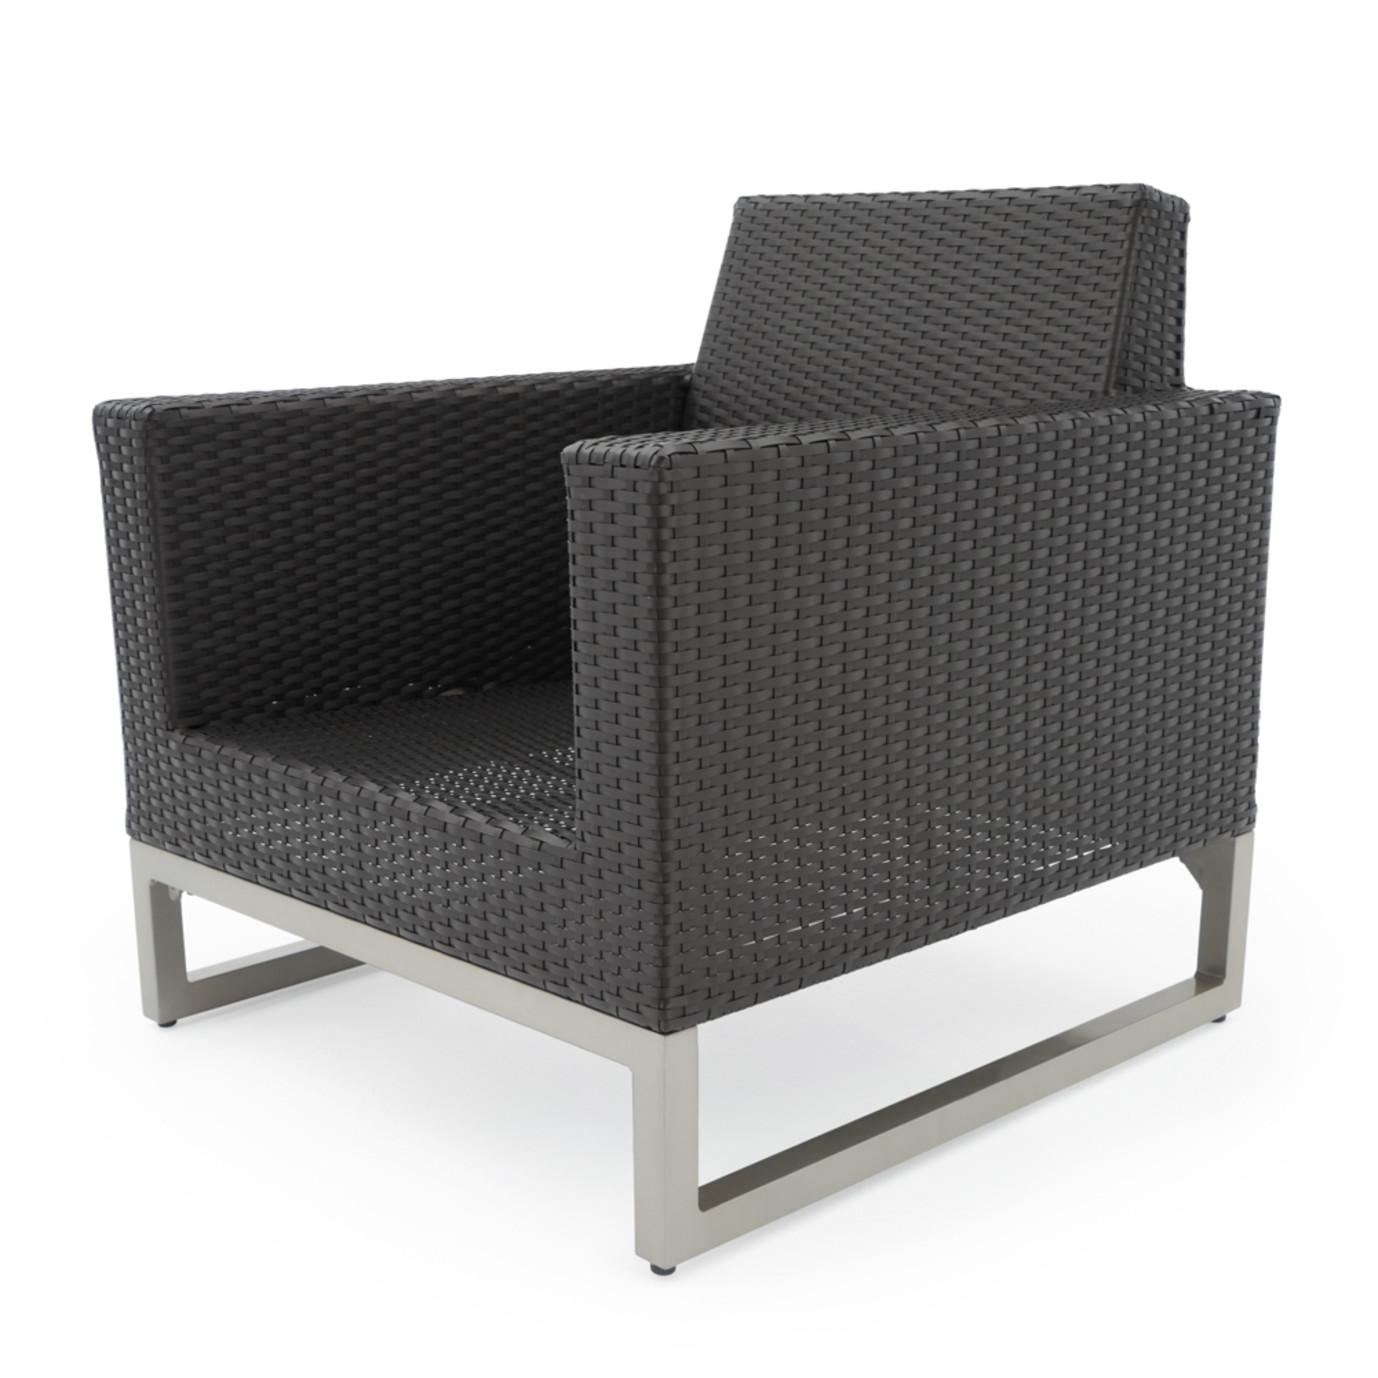 Milo™ Espresso 4pc Seating Set - Slate Gray